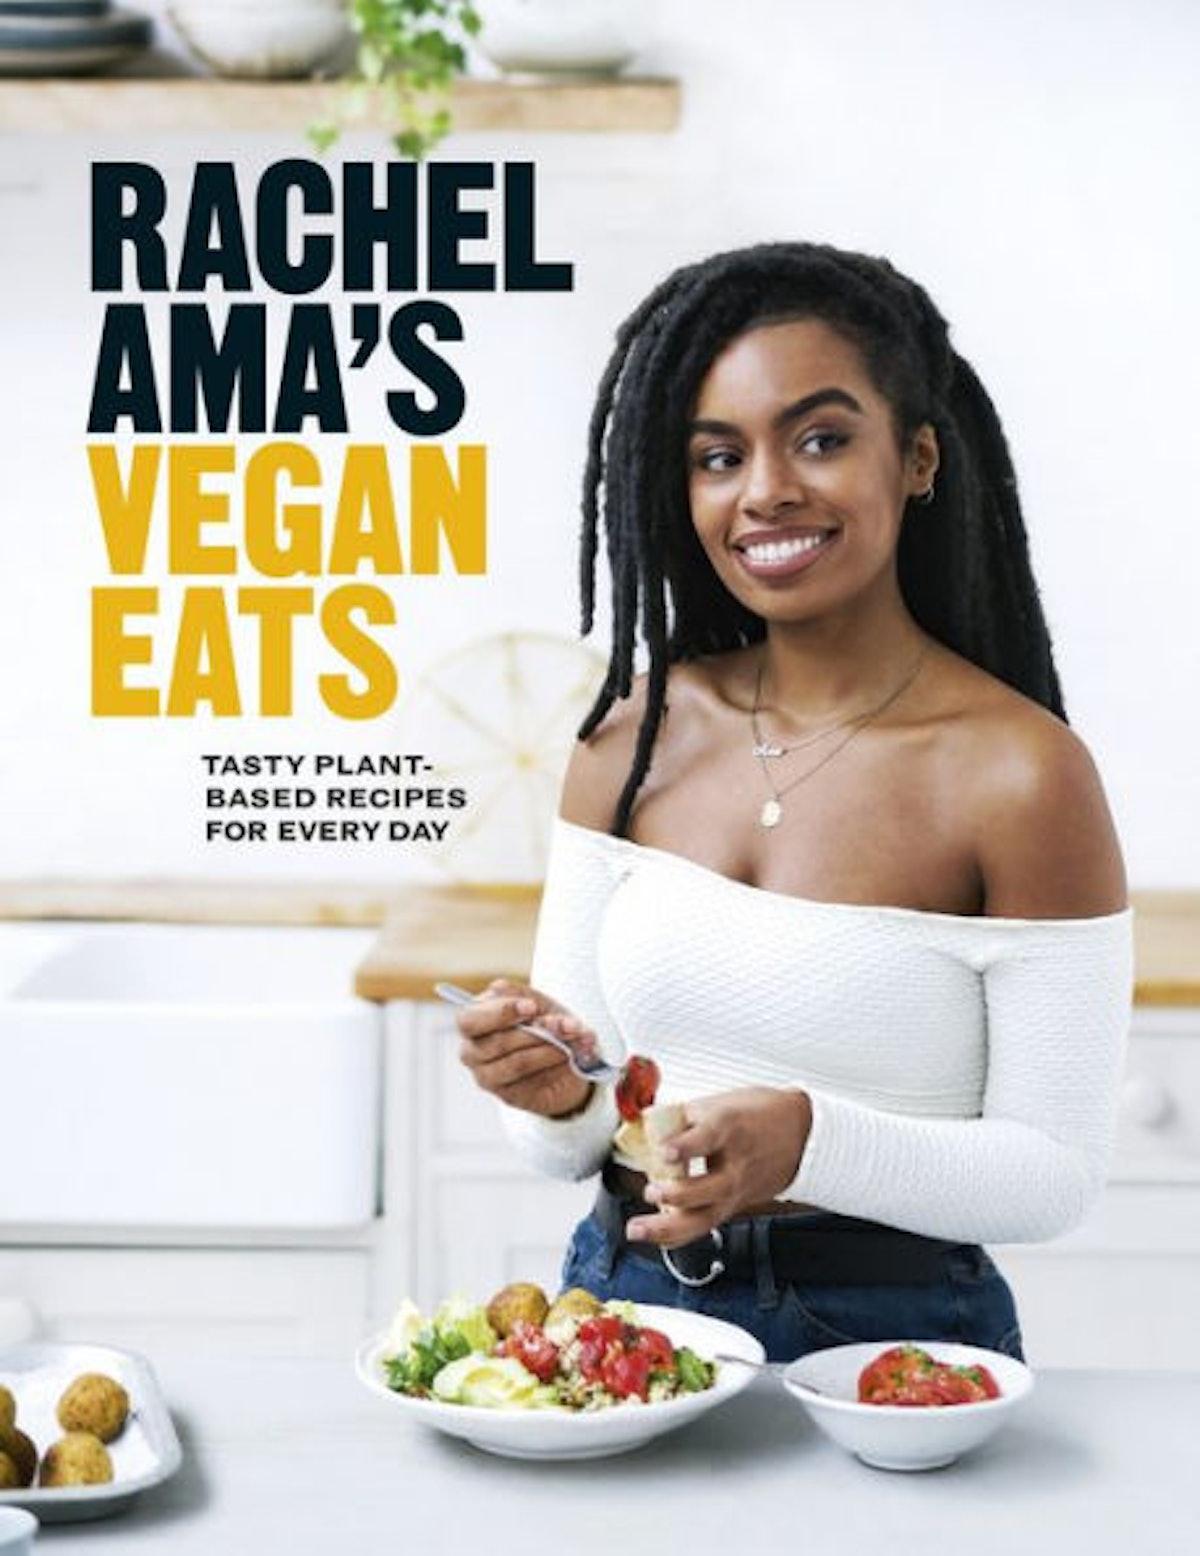 'Rachel Ama's Vegan Eats: Tasty Plant-Based Recipes for Every Day' by Rachel Ama